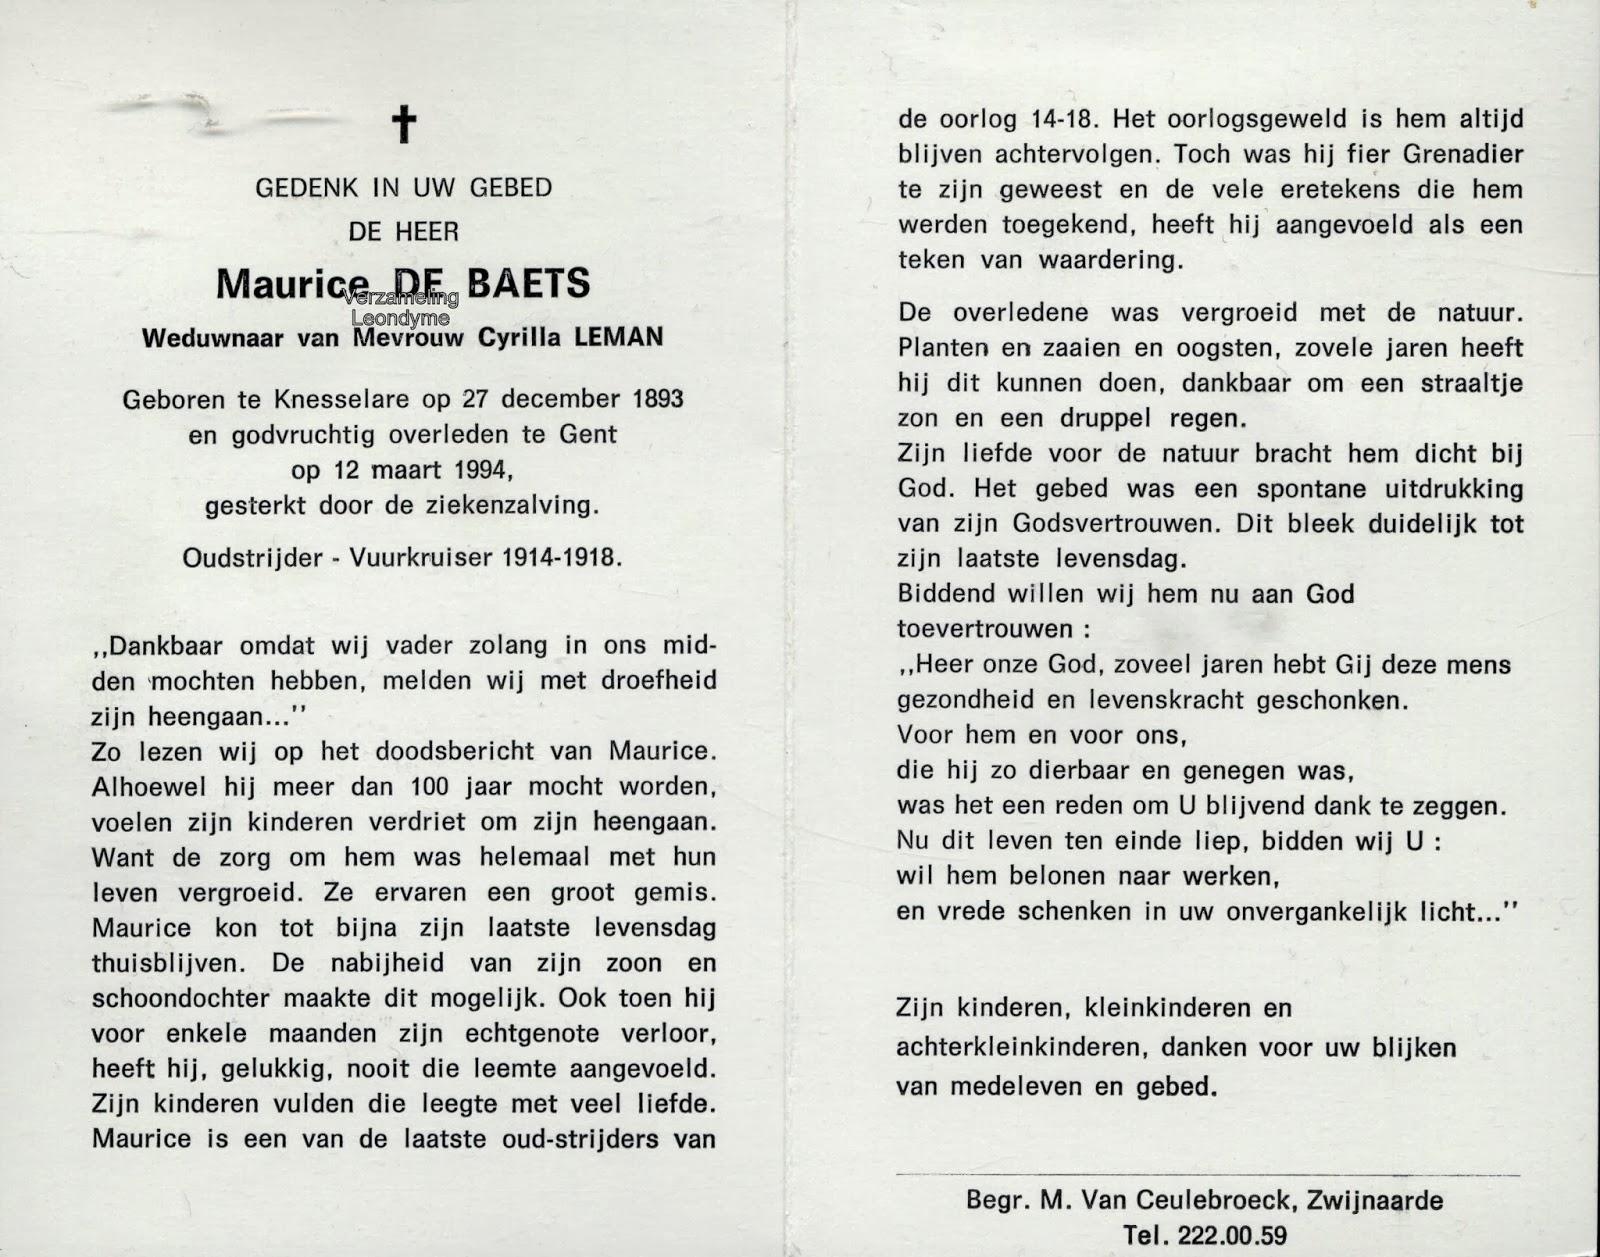 Bidprentje Maurice De Baets. Verzameling Leondyme.